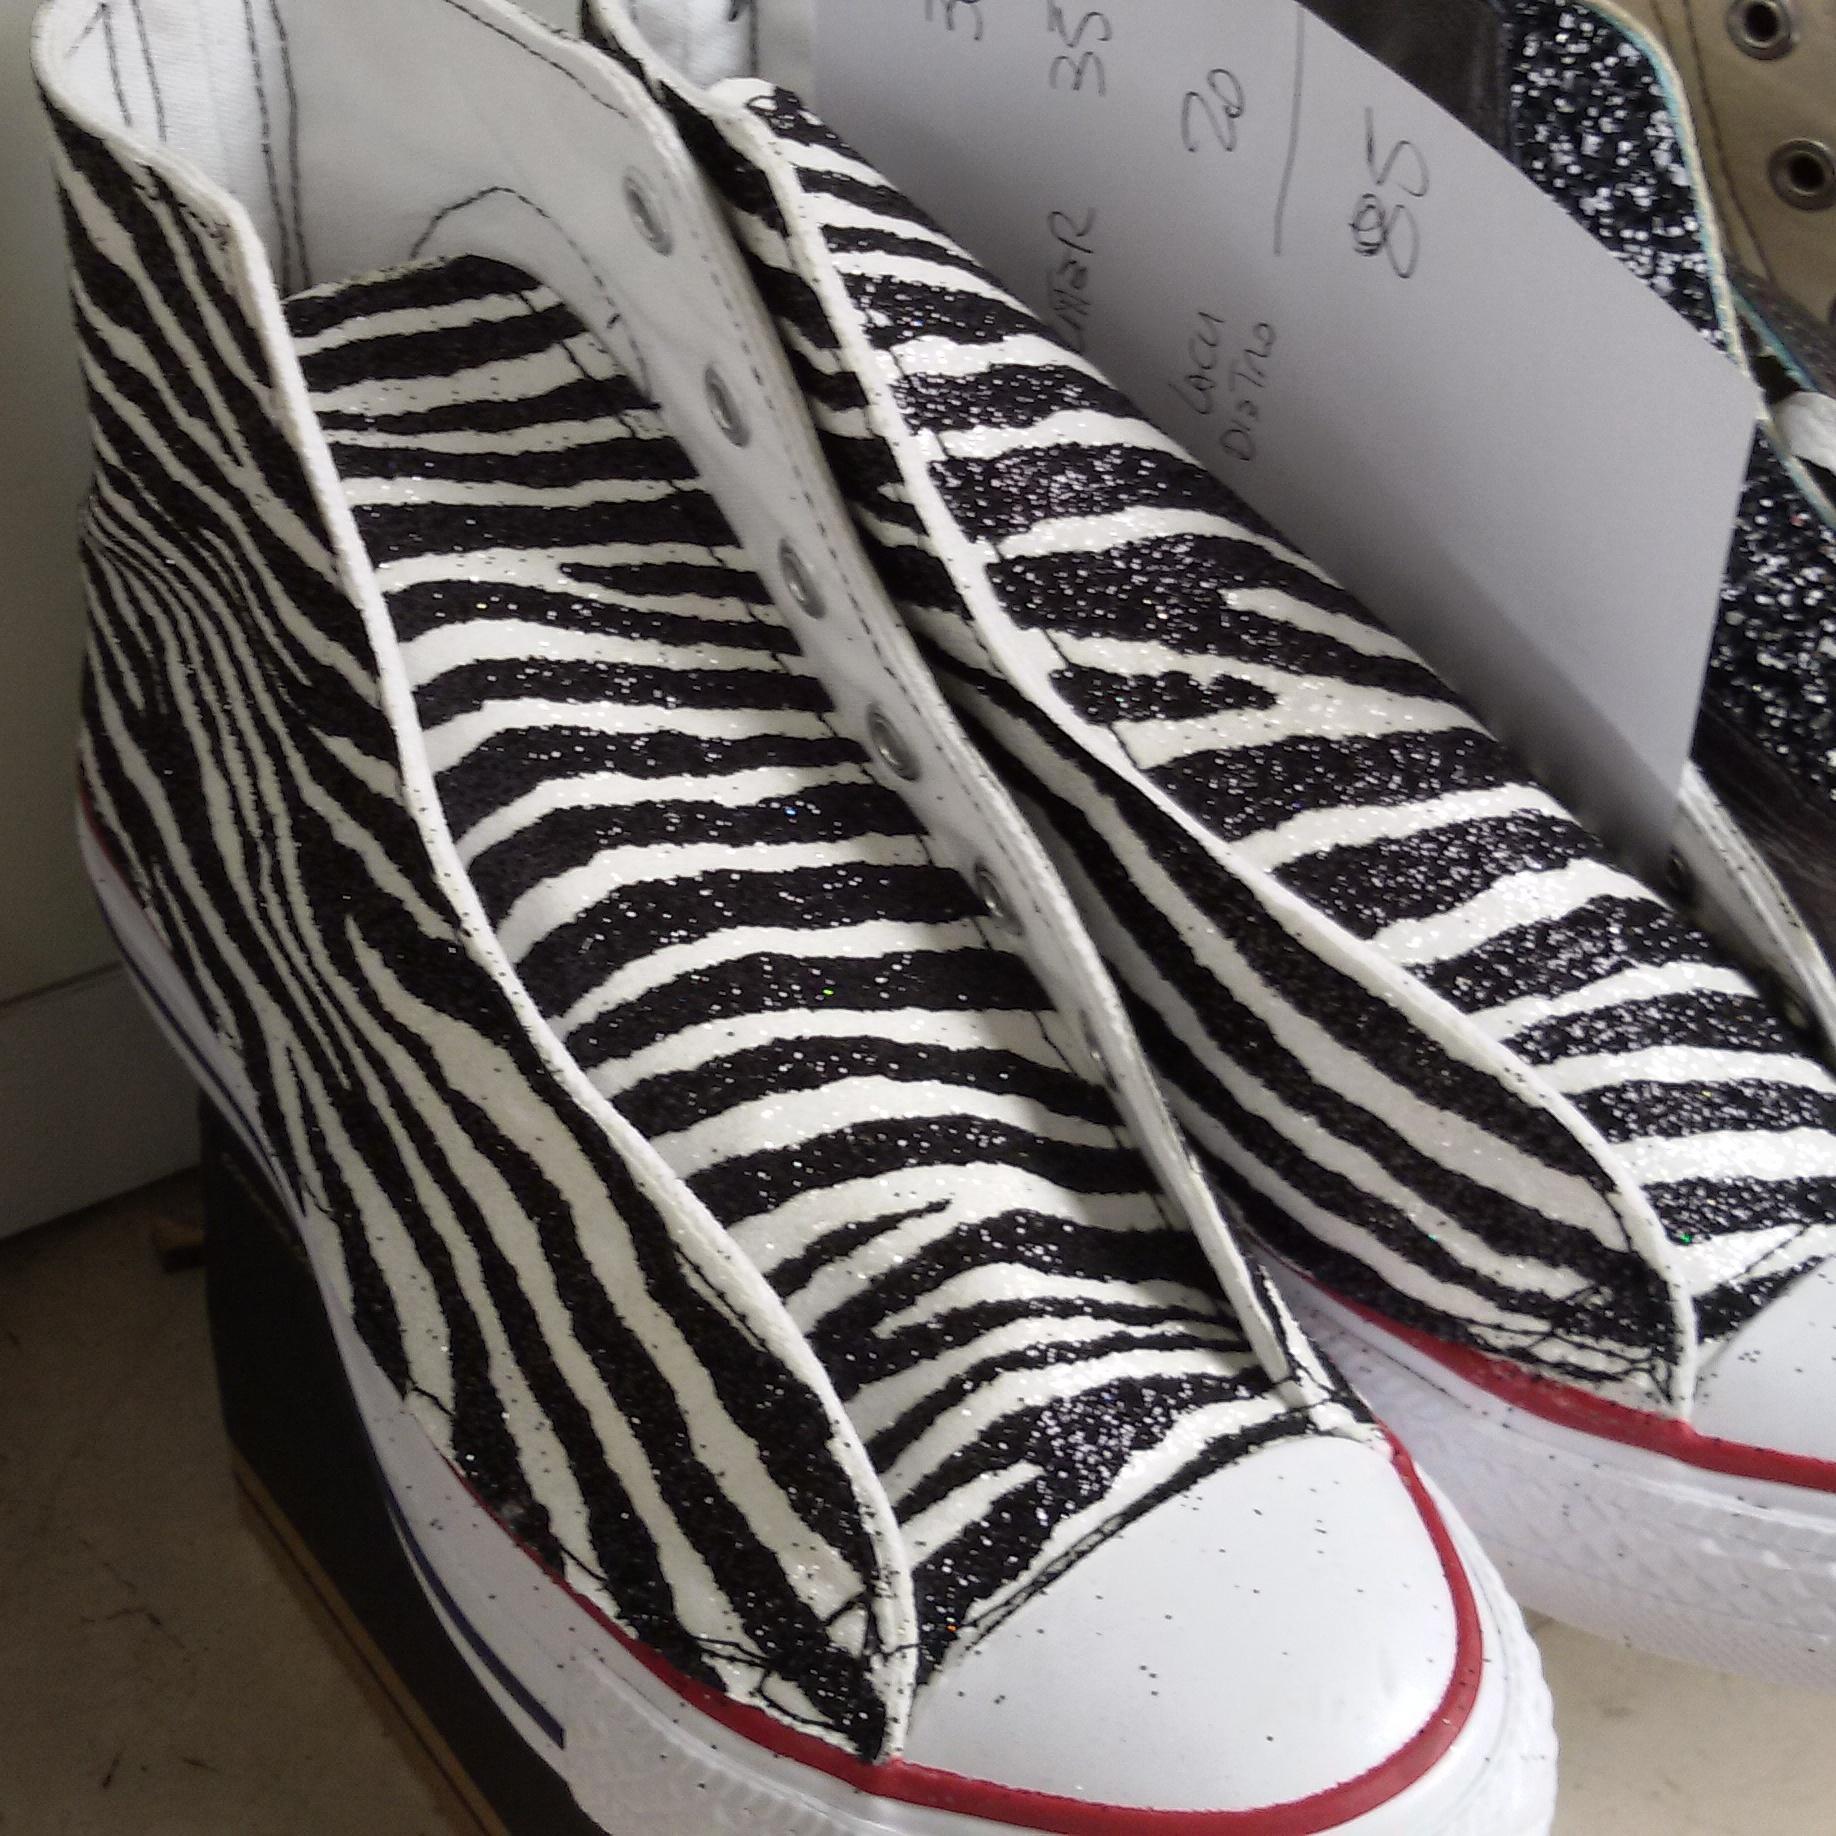 Artigianocalzolaio all star rivestita in glitter zebrato